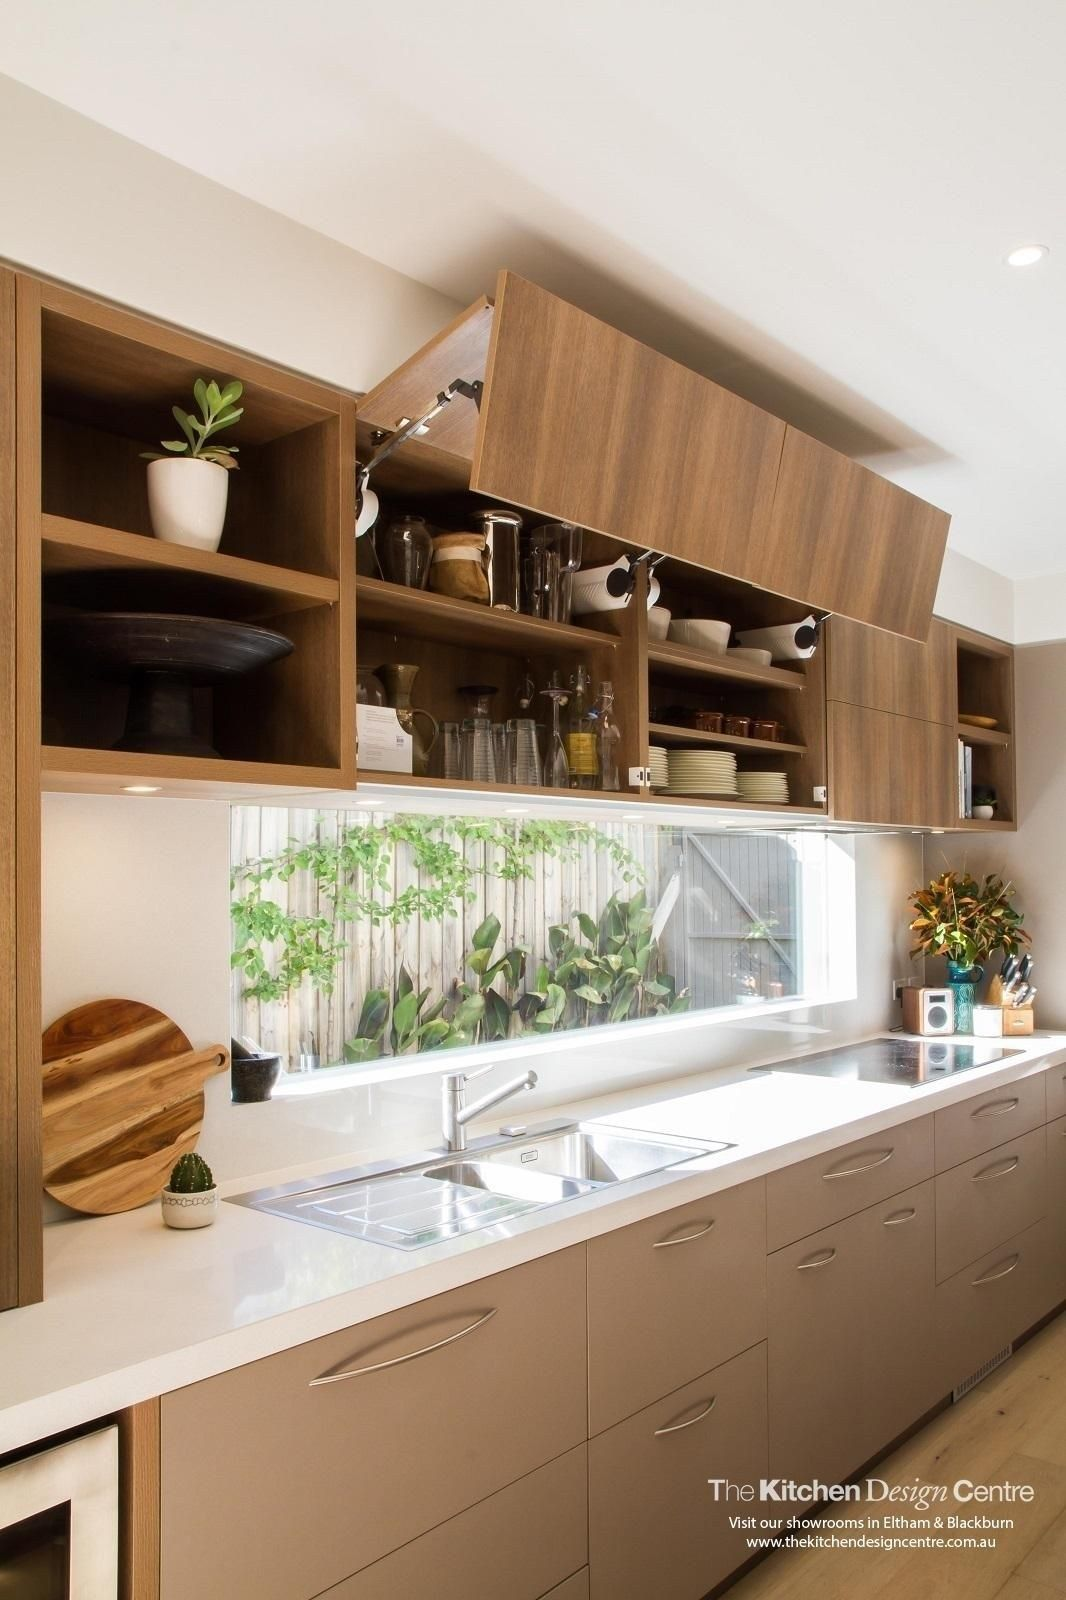 40 Elegant Et Moderne Meuble De Cuisine Design Idees Cuisine Contemporaine Meuble Haut Cuisine Cuisines Design